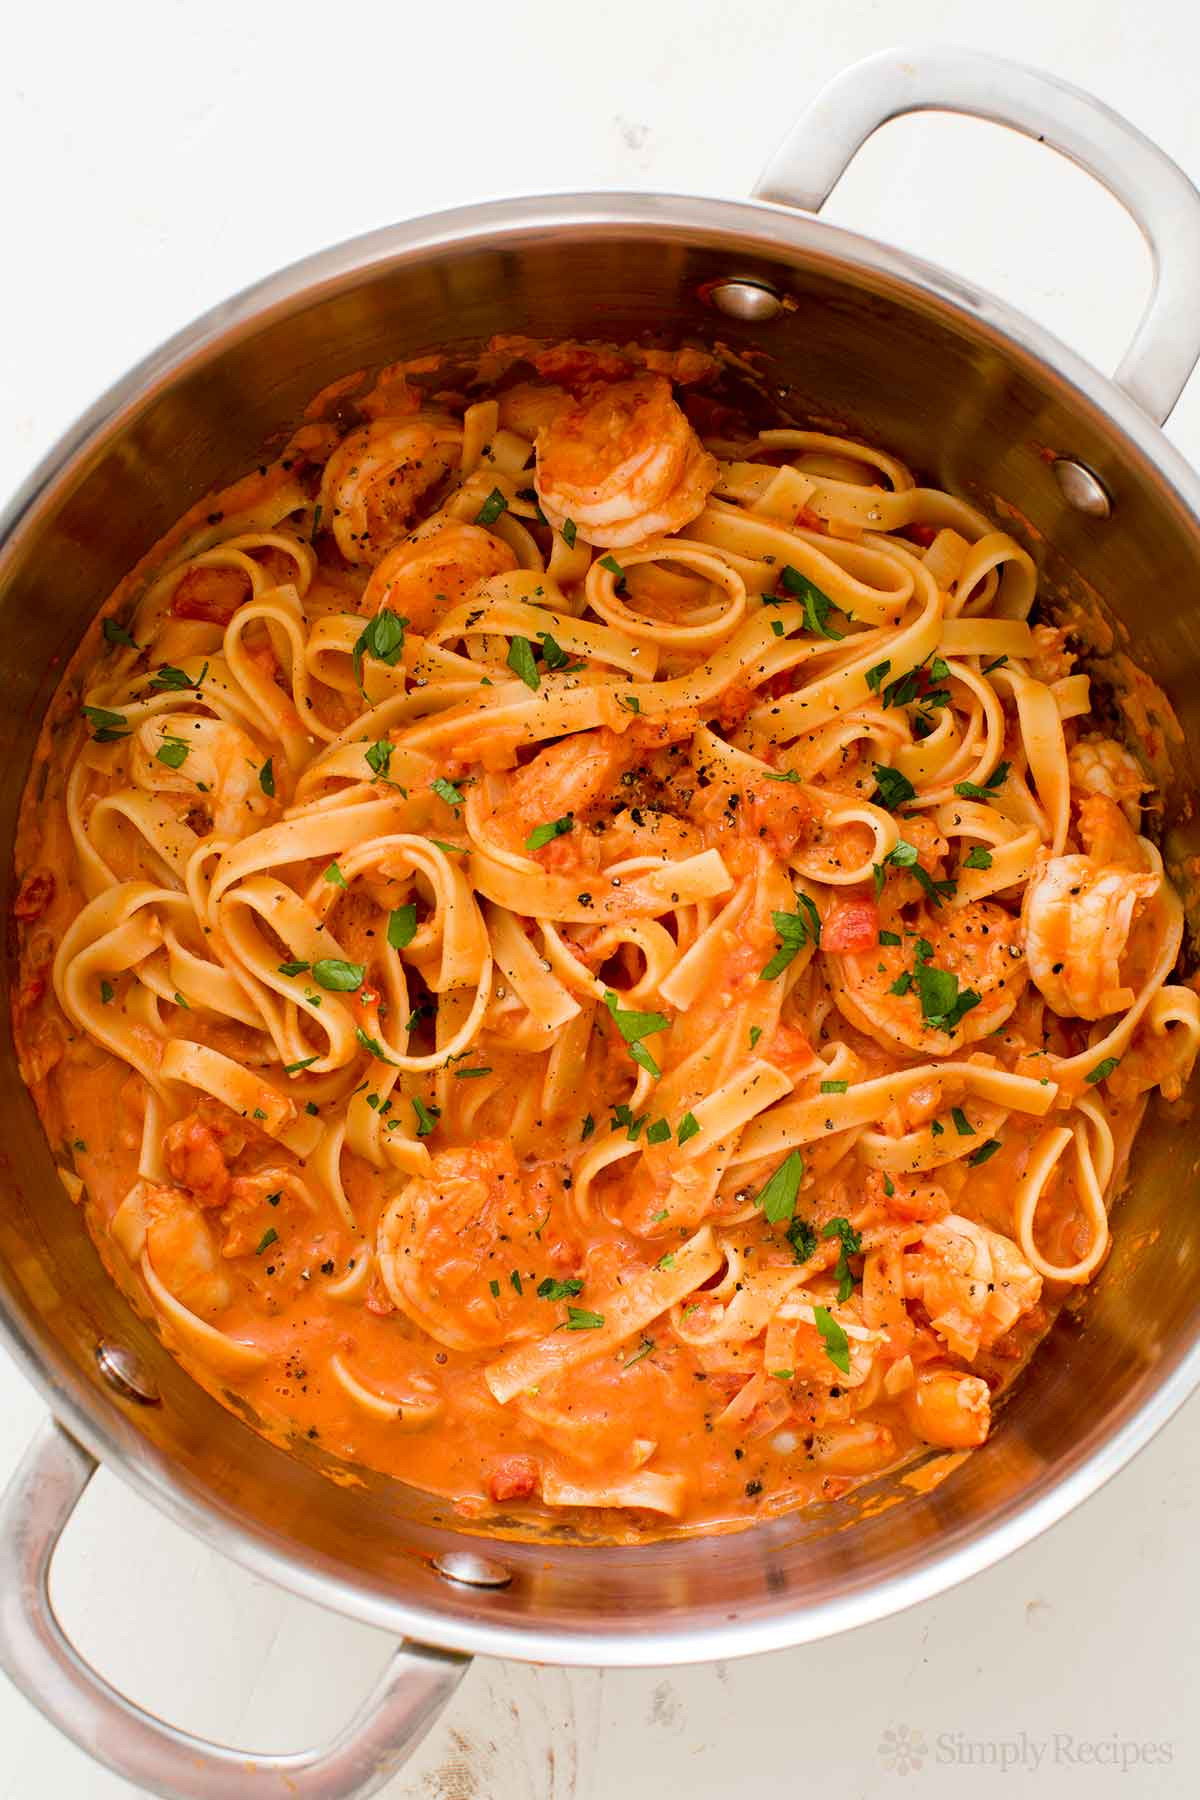 Shrimp Recipes Pasta  Shrimp Pasta alla Vodka Recipe with video